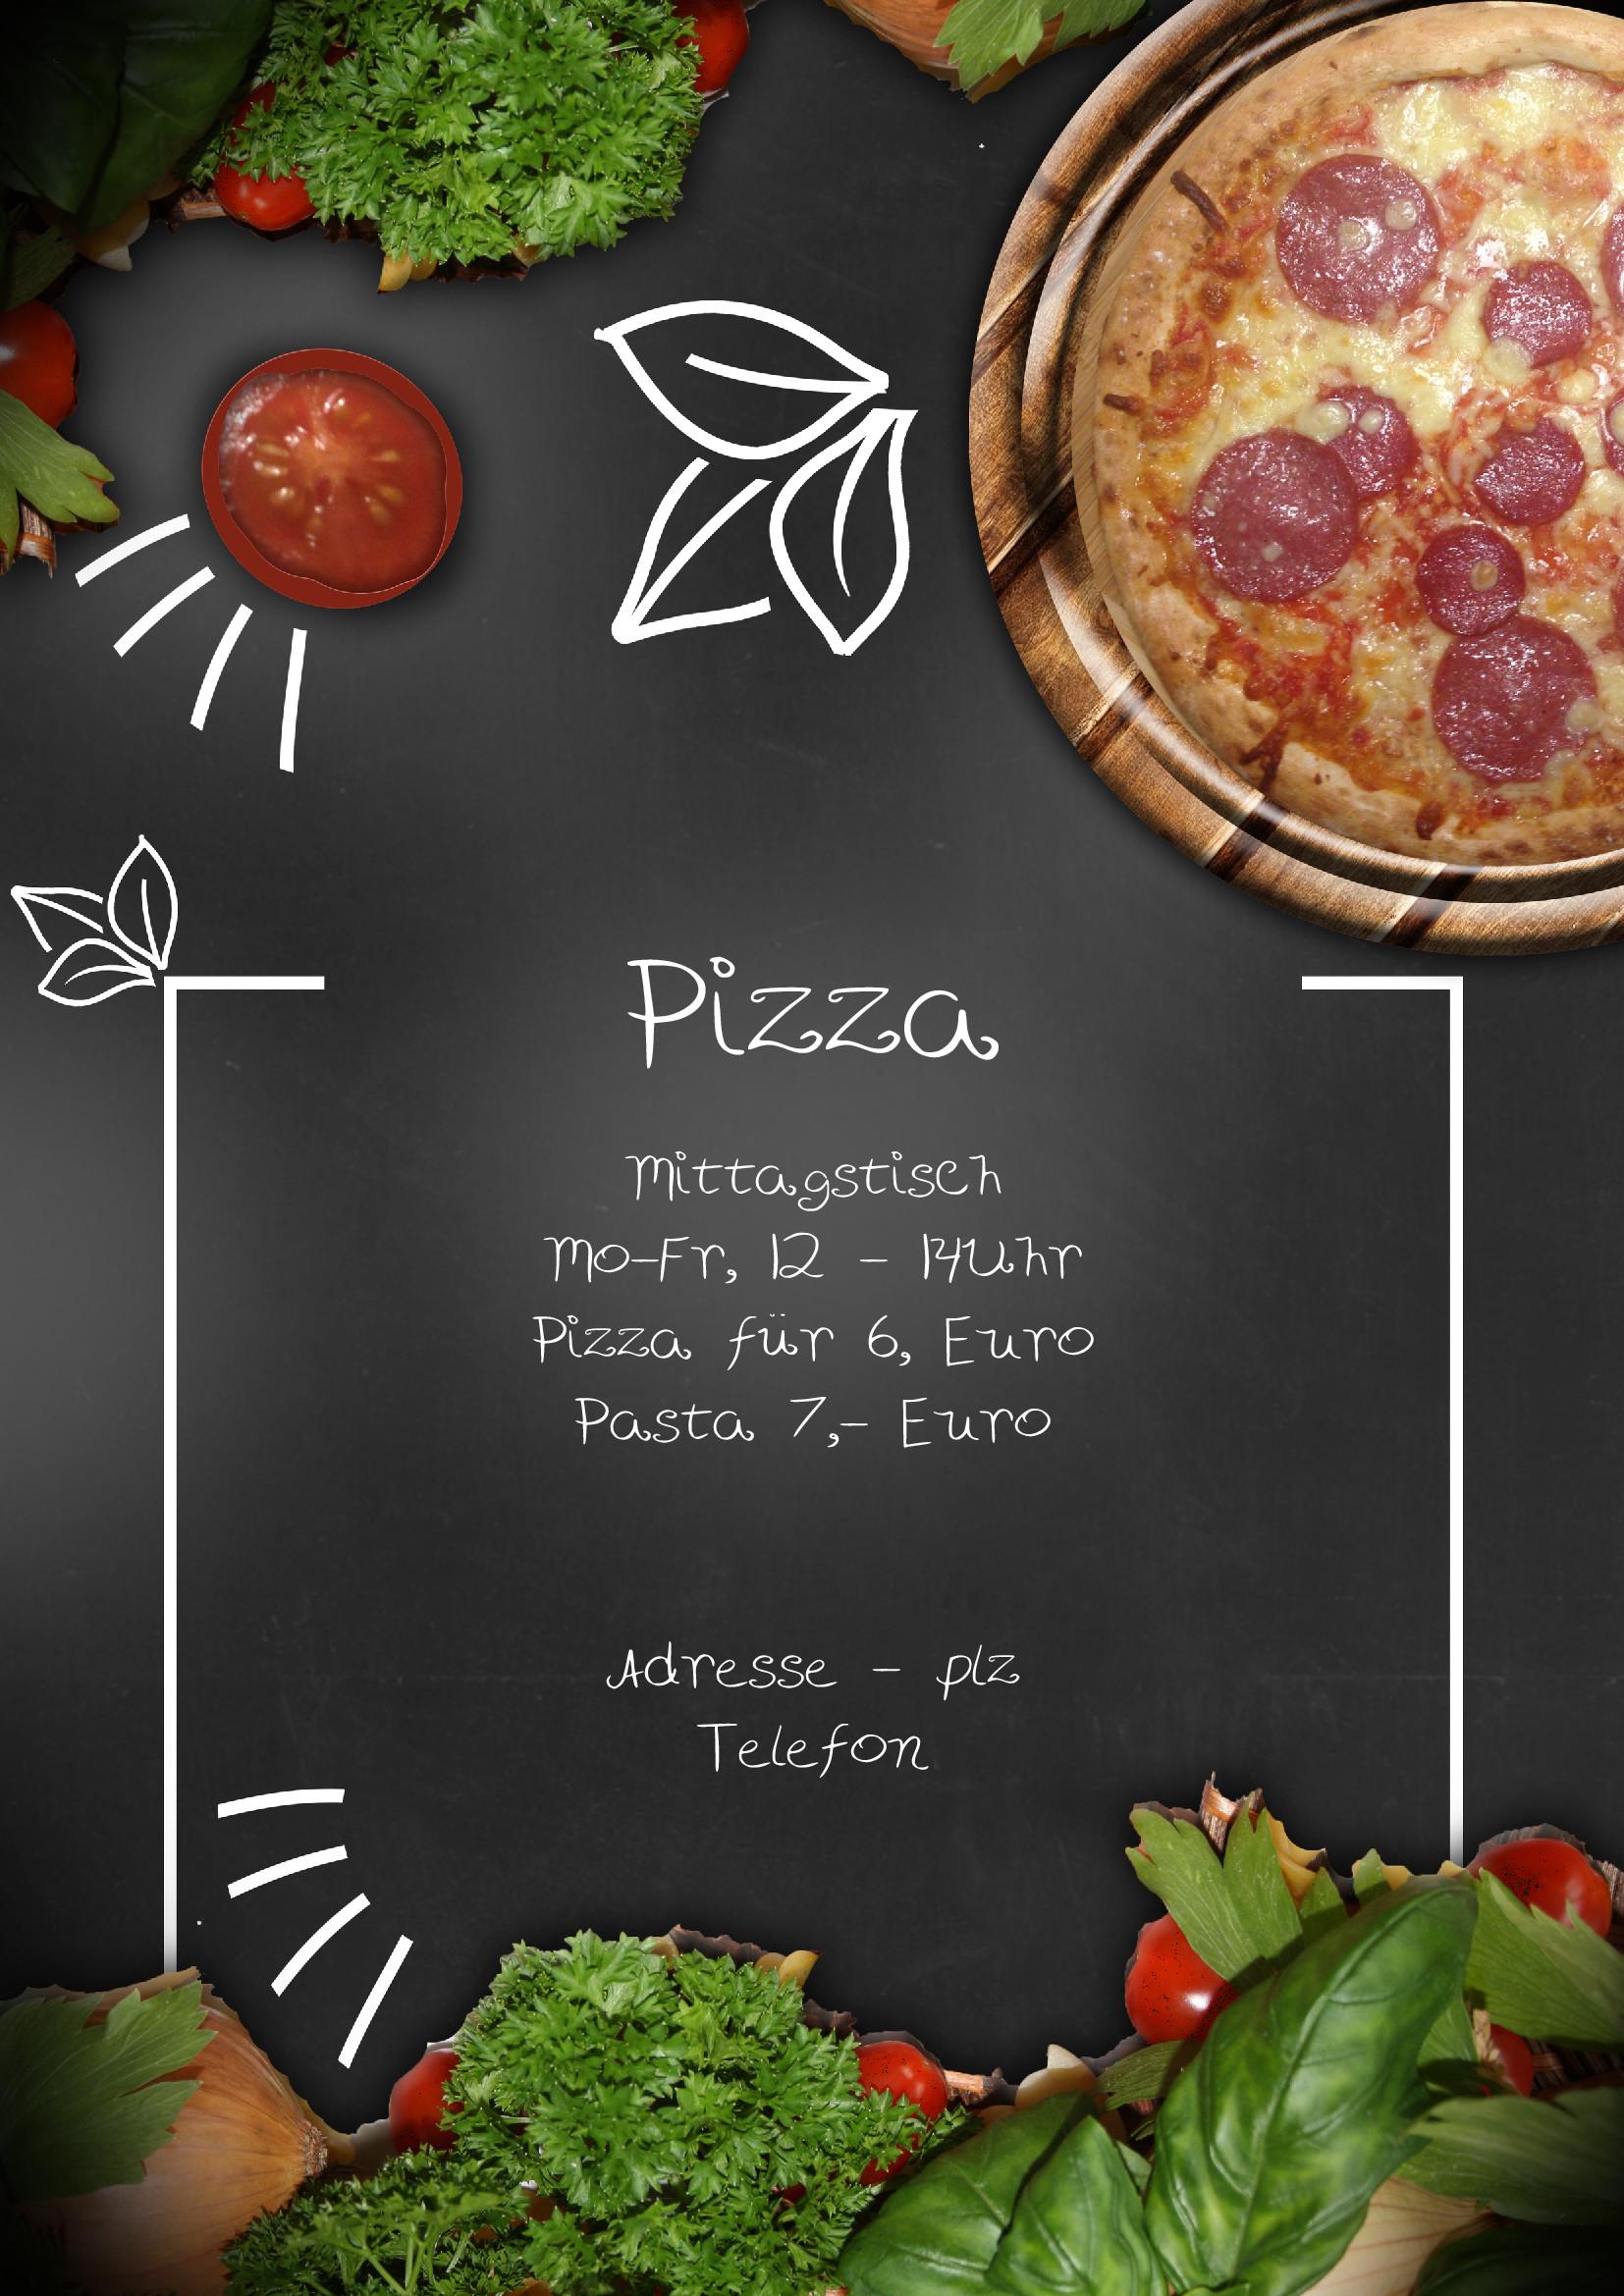 speisekarten und men u00fckarten  italian flavor pizza shop